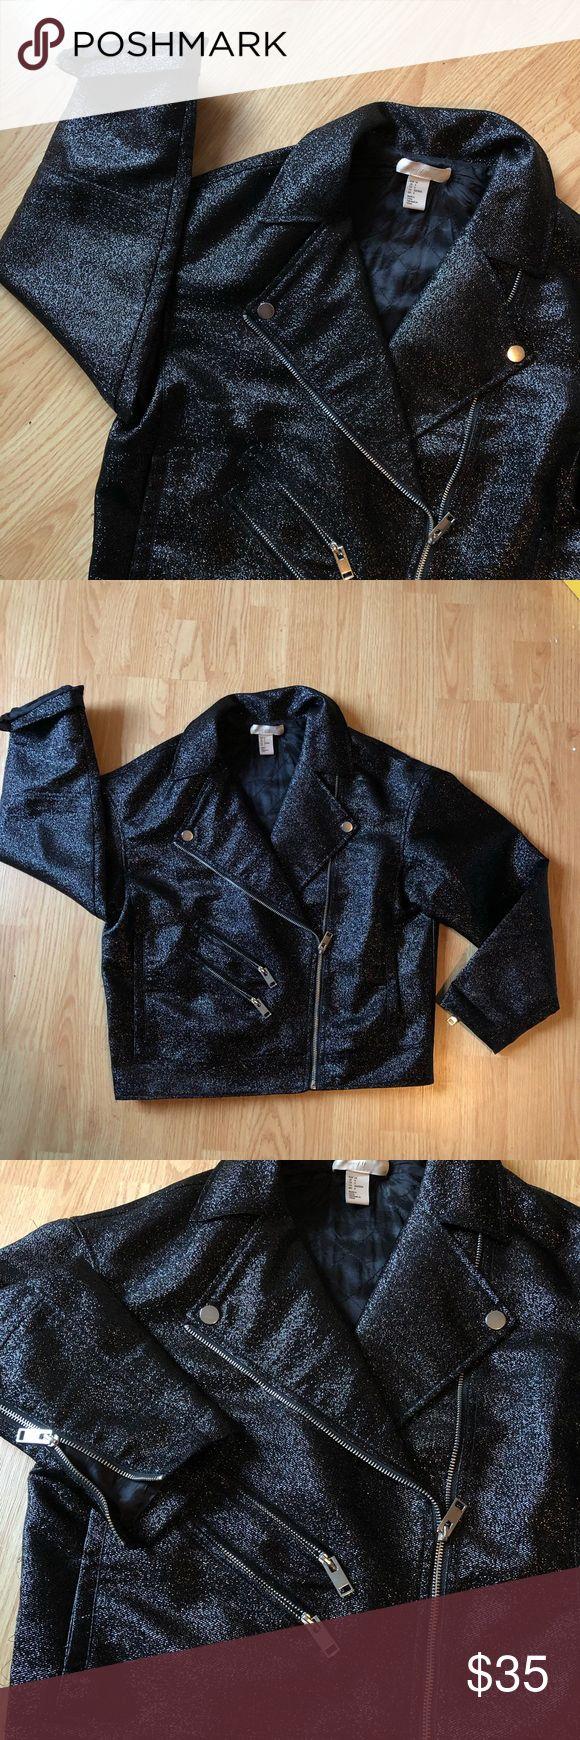 H&M OVERSIZED GLITTER BIKER JACKET Biker jacket, How to